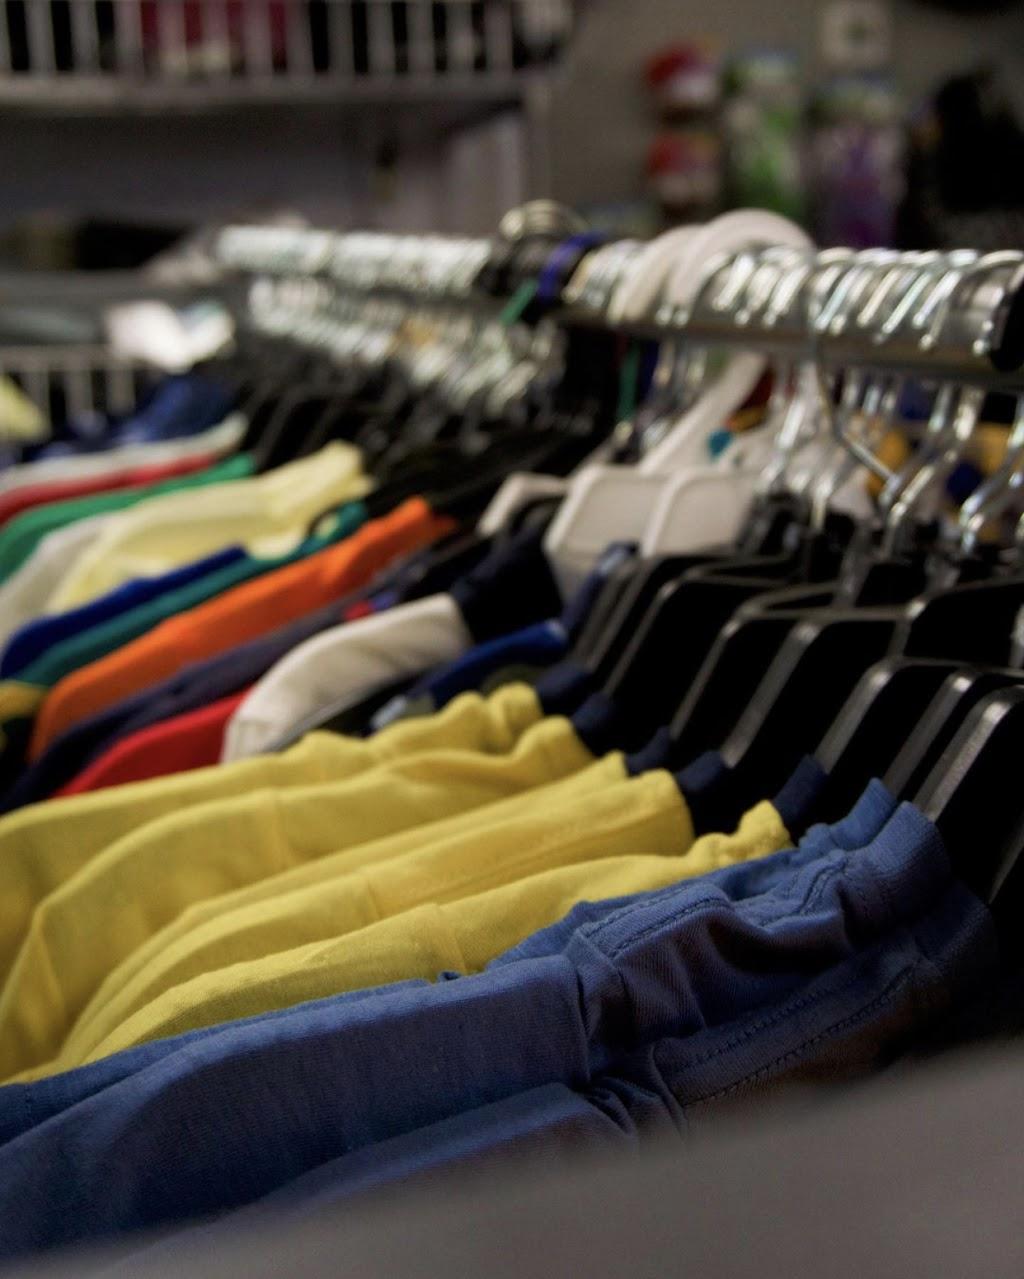 Pomona Thrift & Variety Discount Store - store    Photo 8 of 10   Address: 3250 N Garey Ave, Pomona, CA 91767, USA   Phone: (909) 506-4062